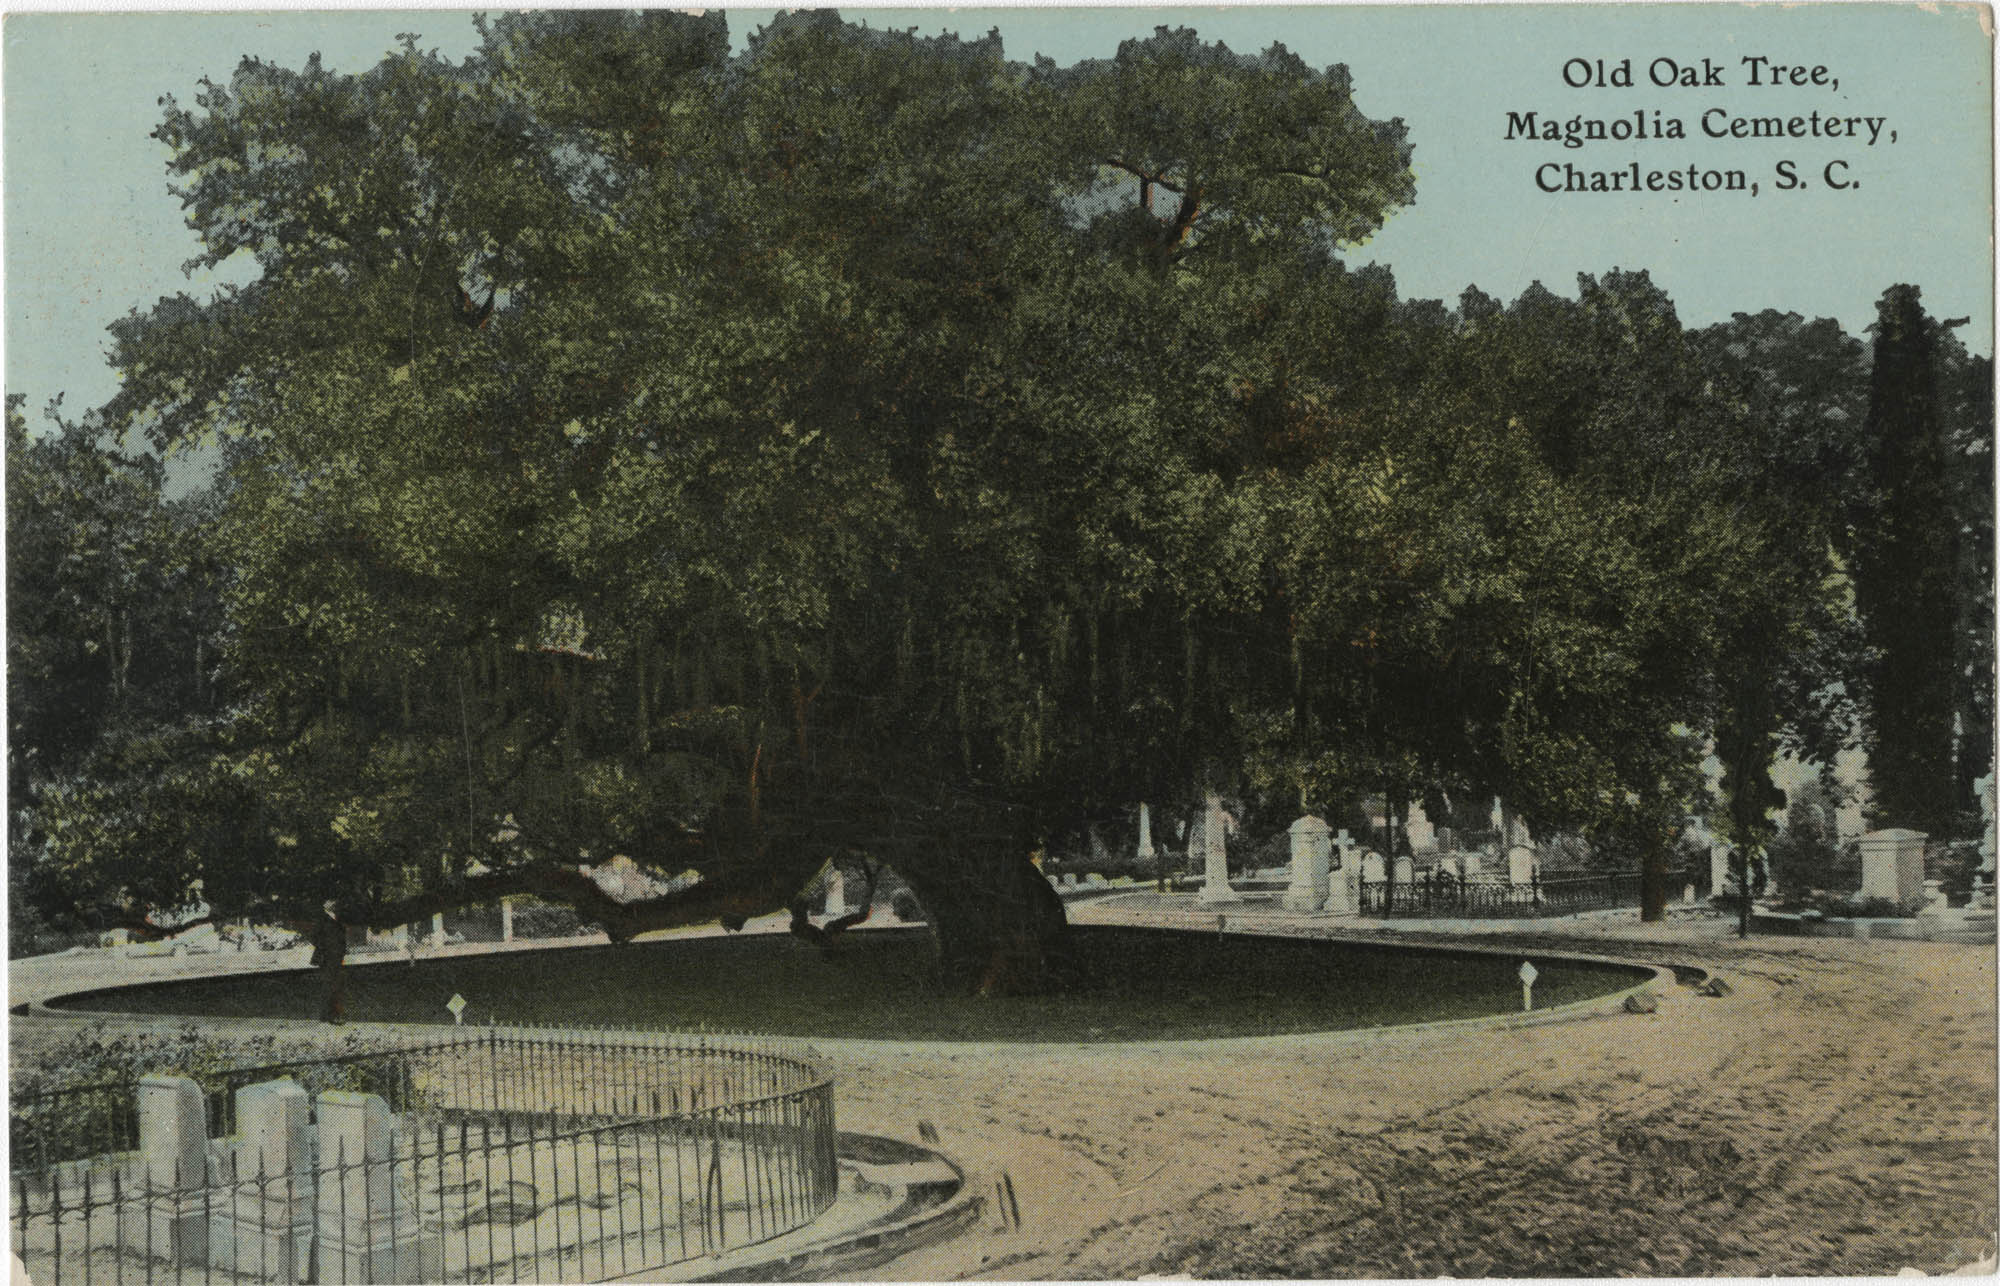 Old Oak Tree, Magnolia Cemetery, Charleston, S.C.